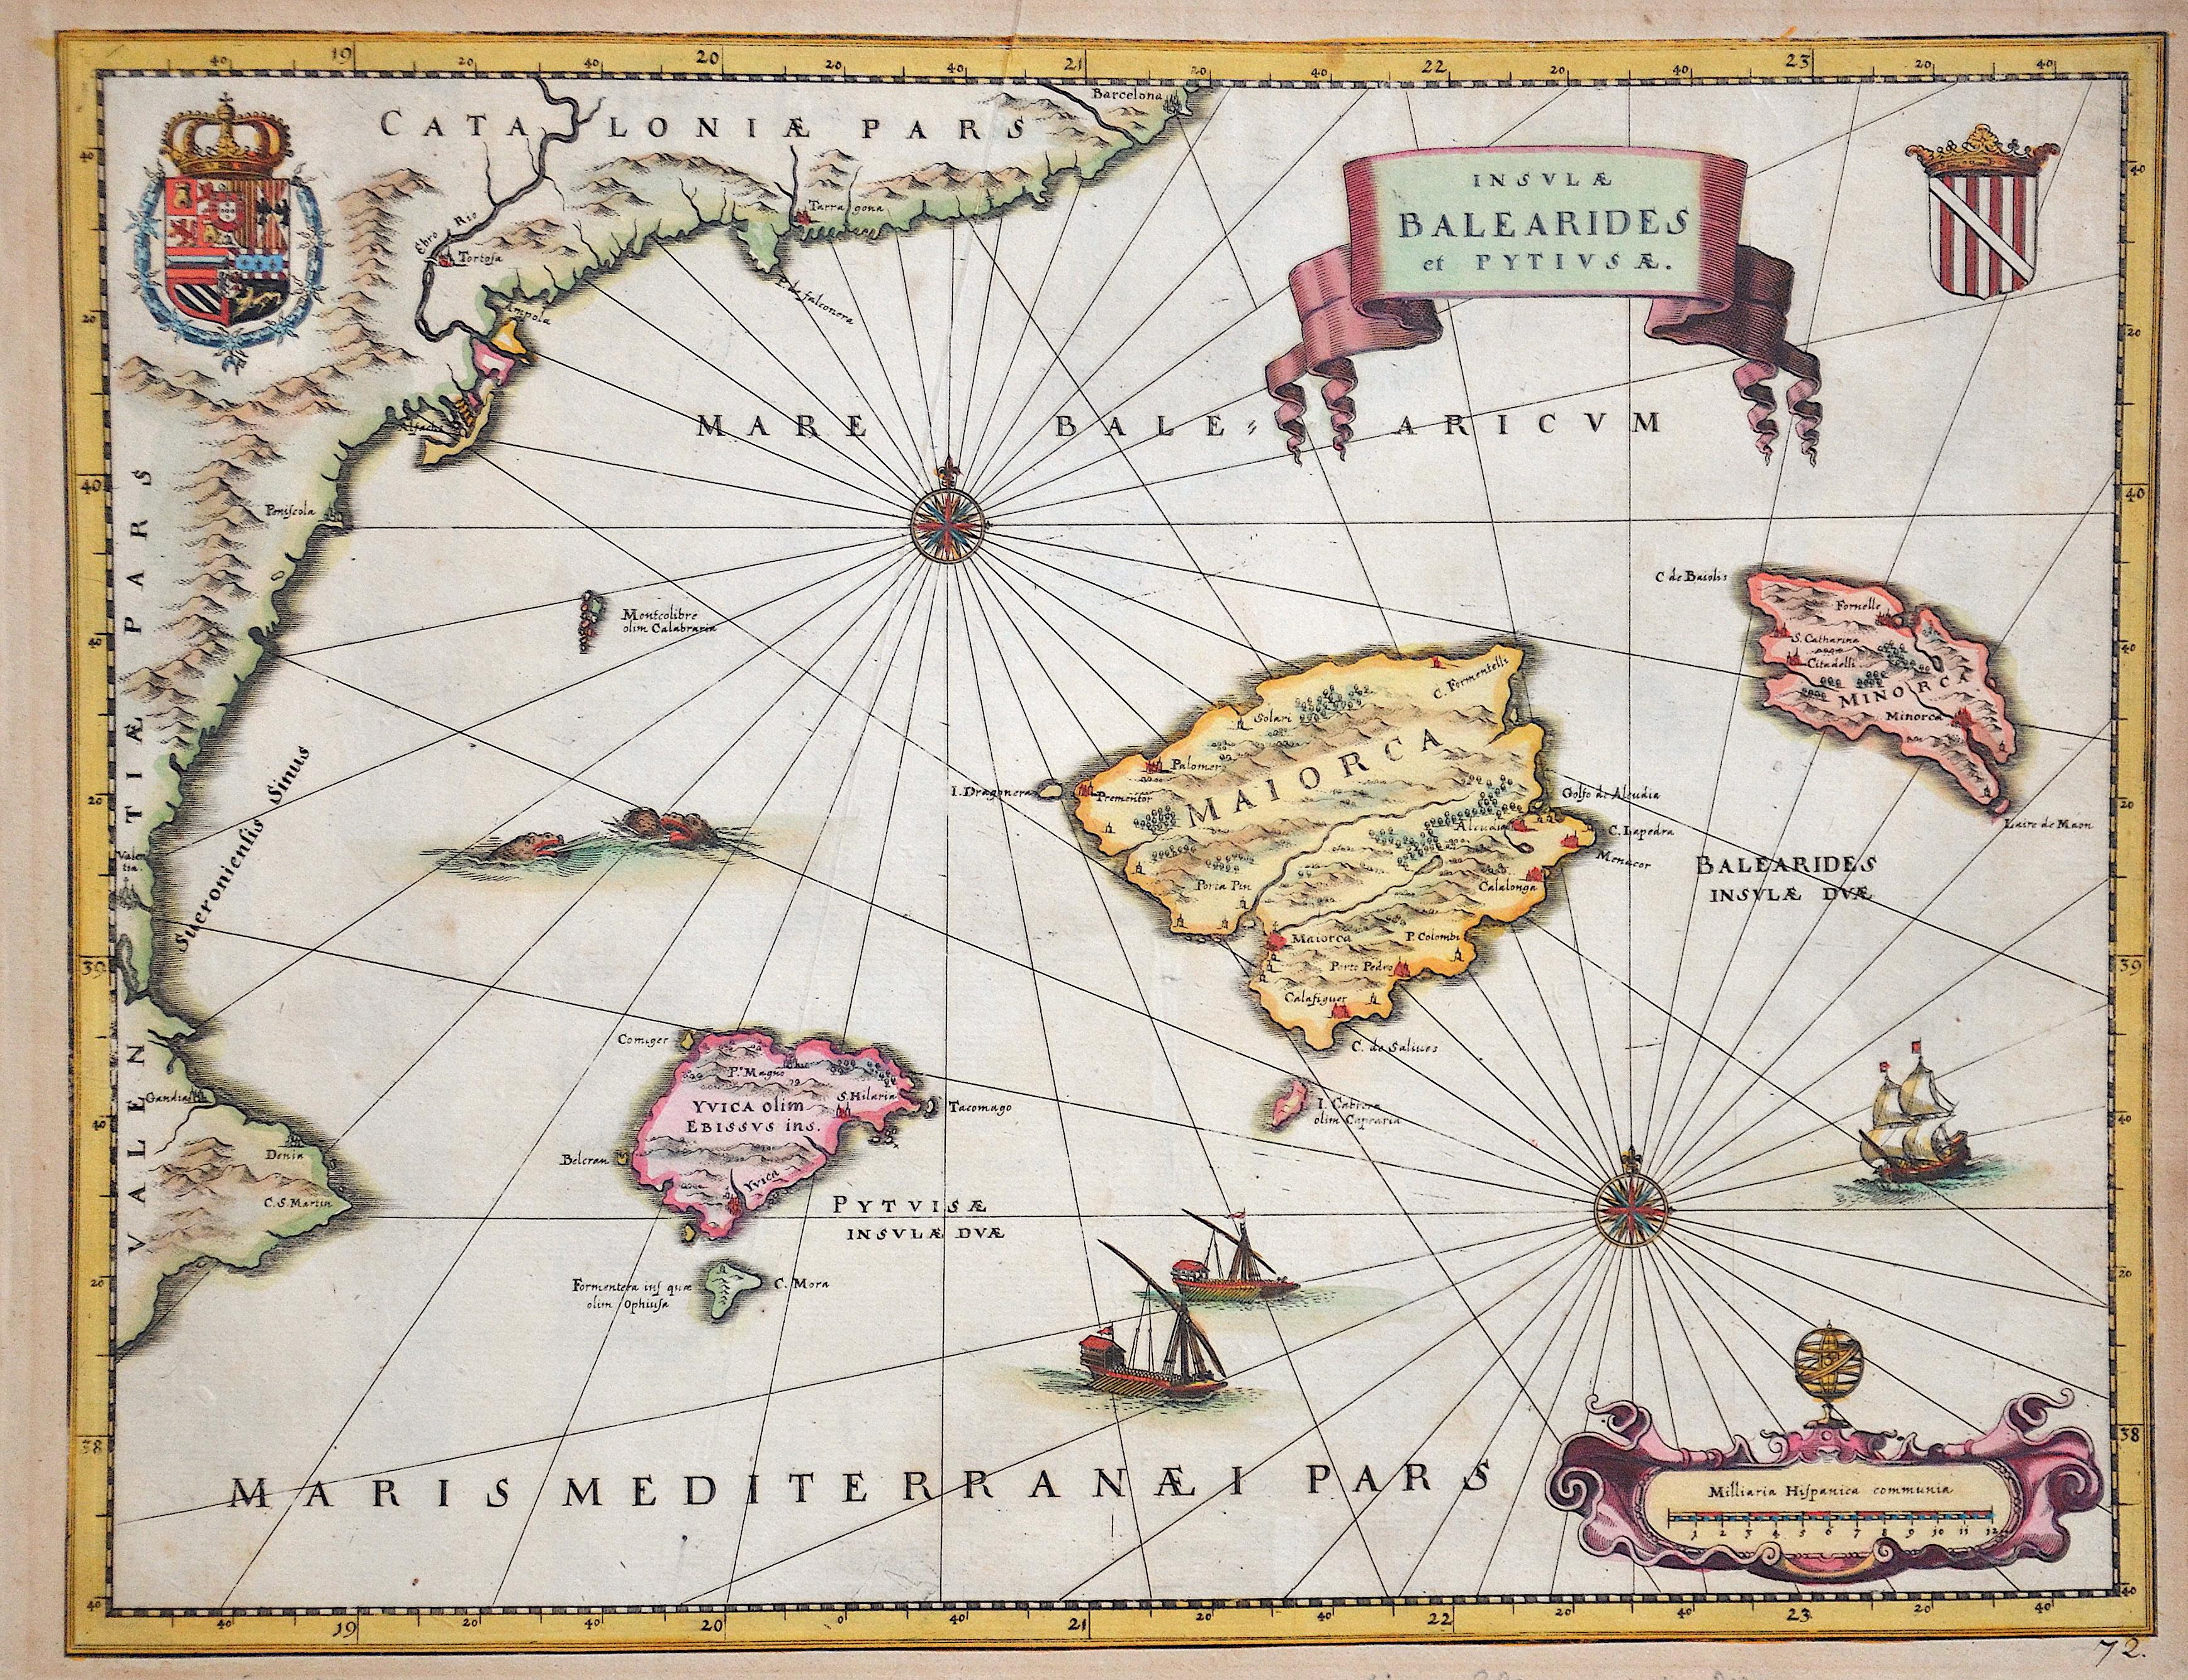 Merian Matthäus Insulae Balearides et Pytiusae.